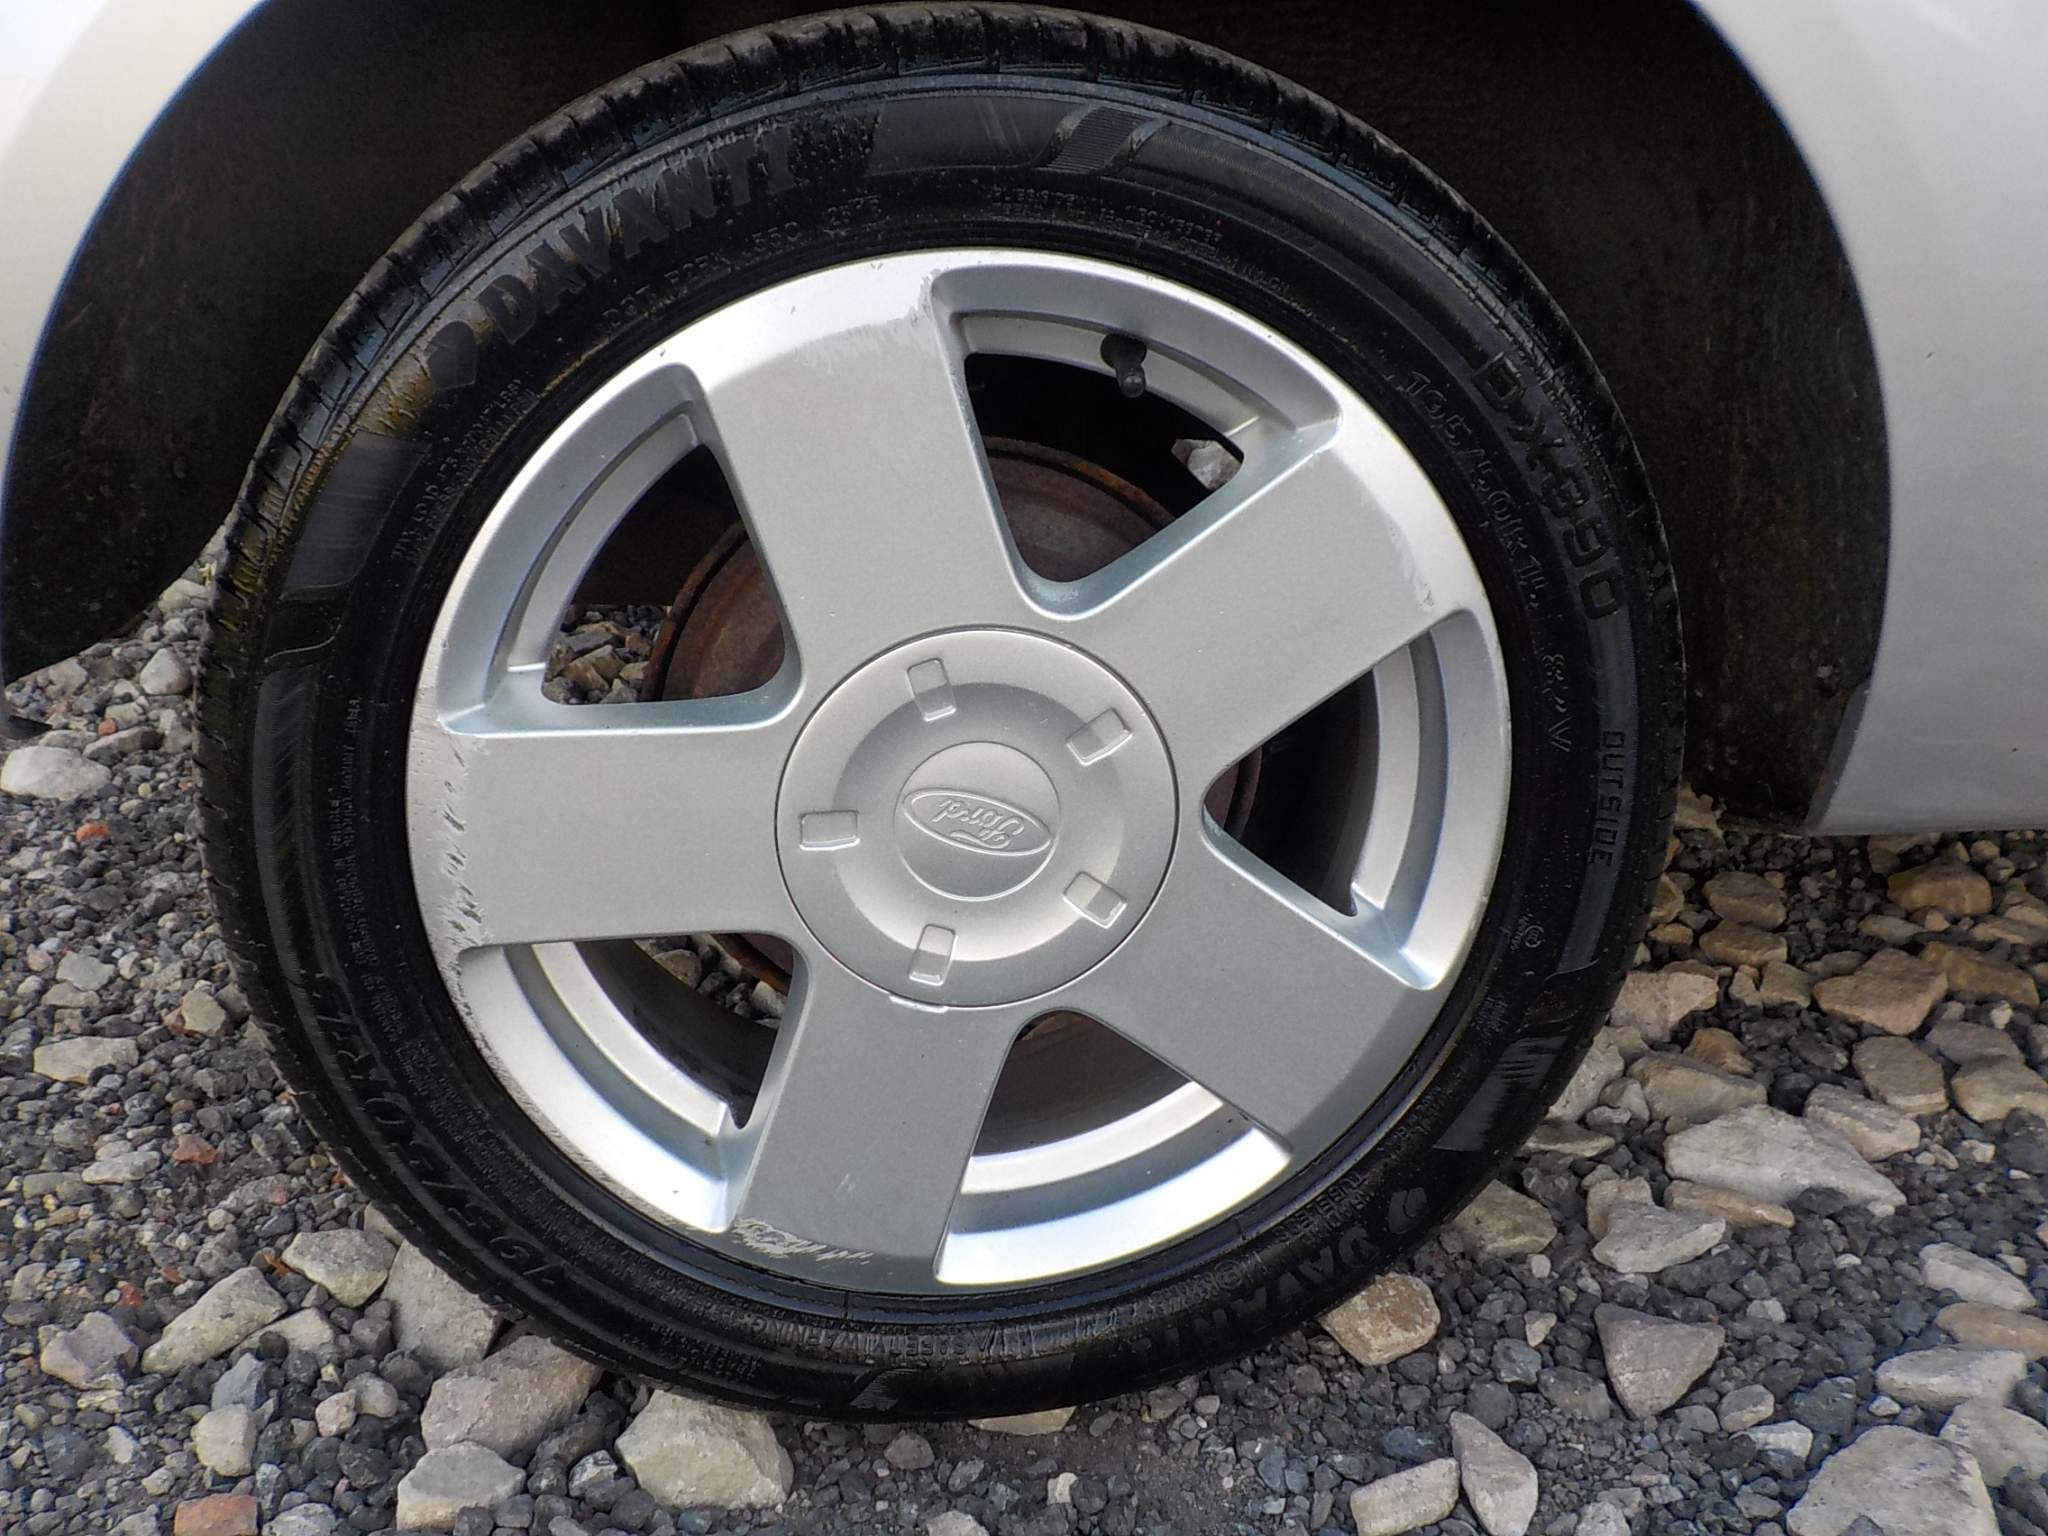 Ford Fiesta 1.25 Zetec 3dr